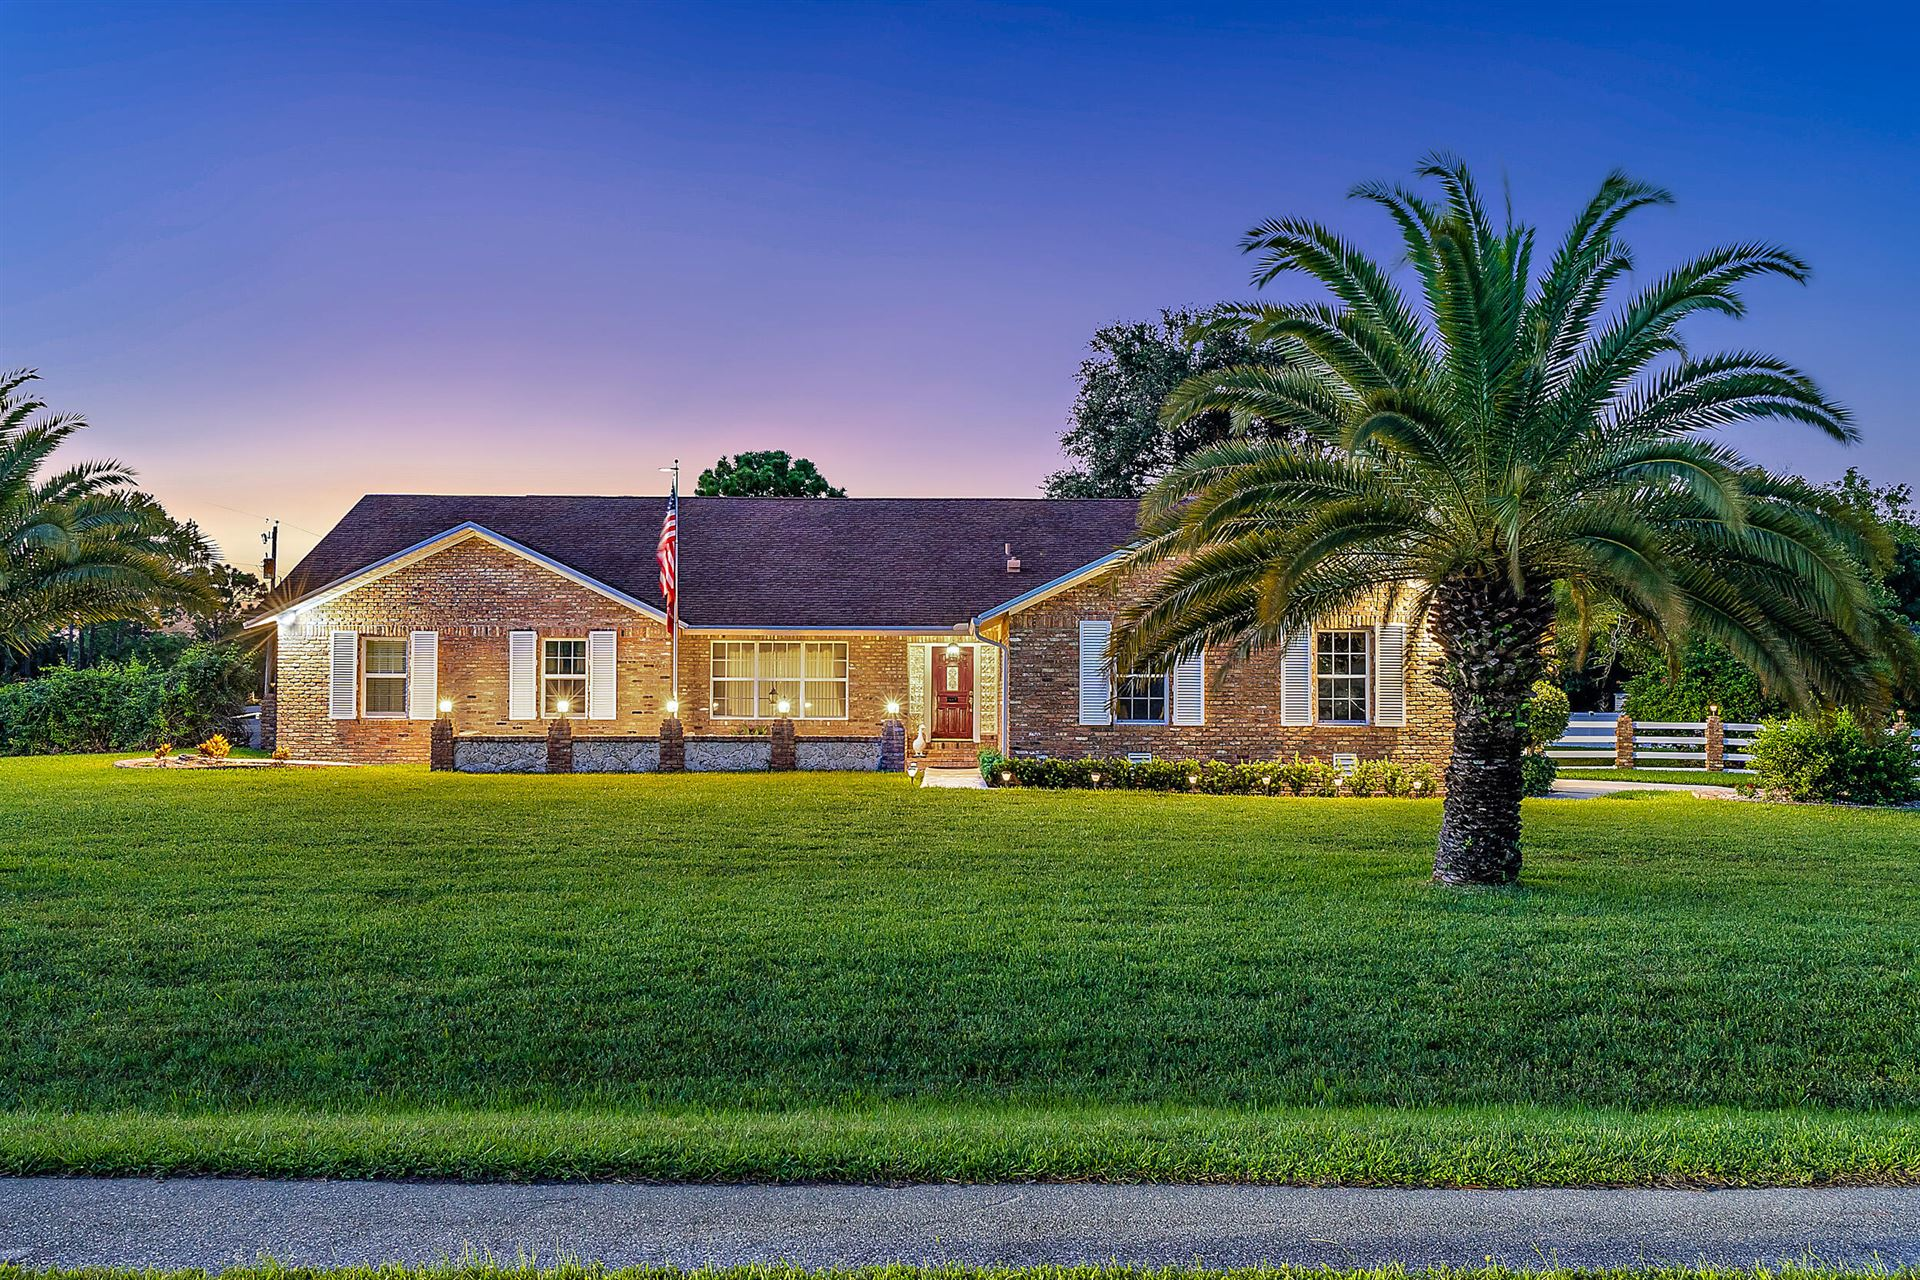 8667 150th Court N, West Palm Beach, FL 33418 - MLS#: RX-10743855